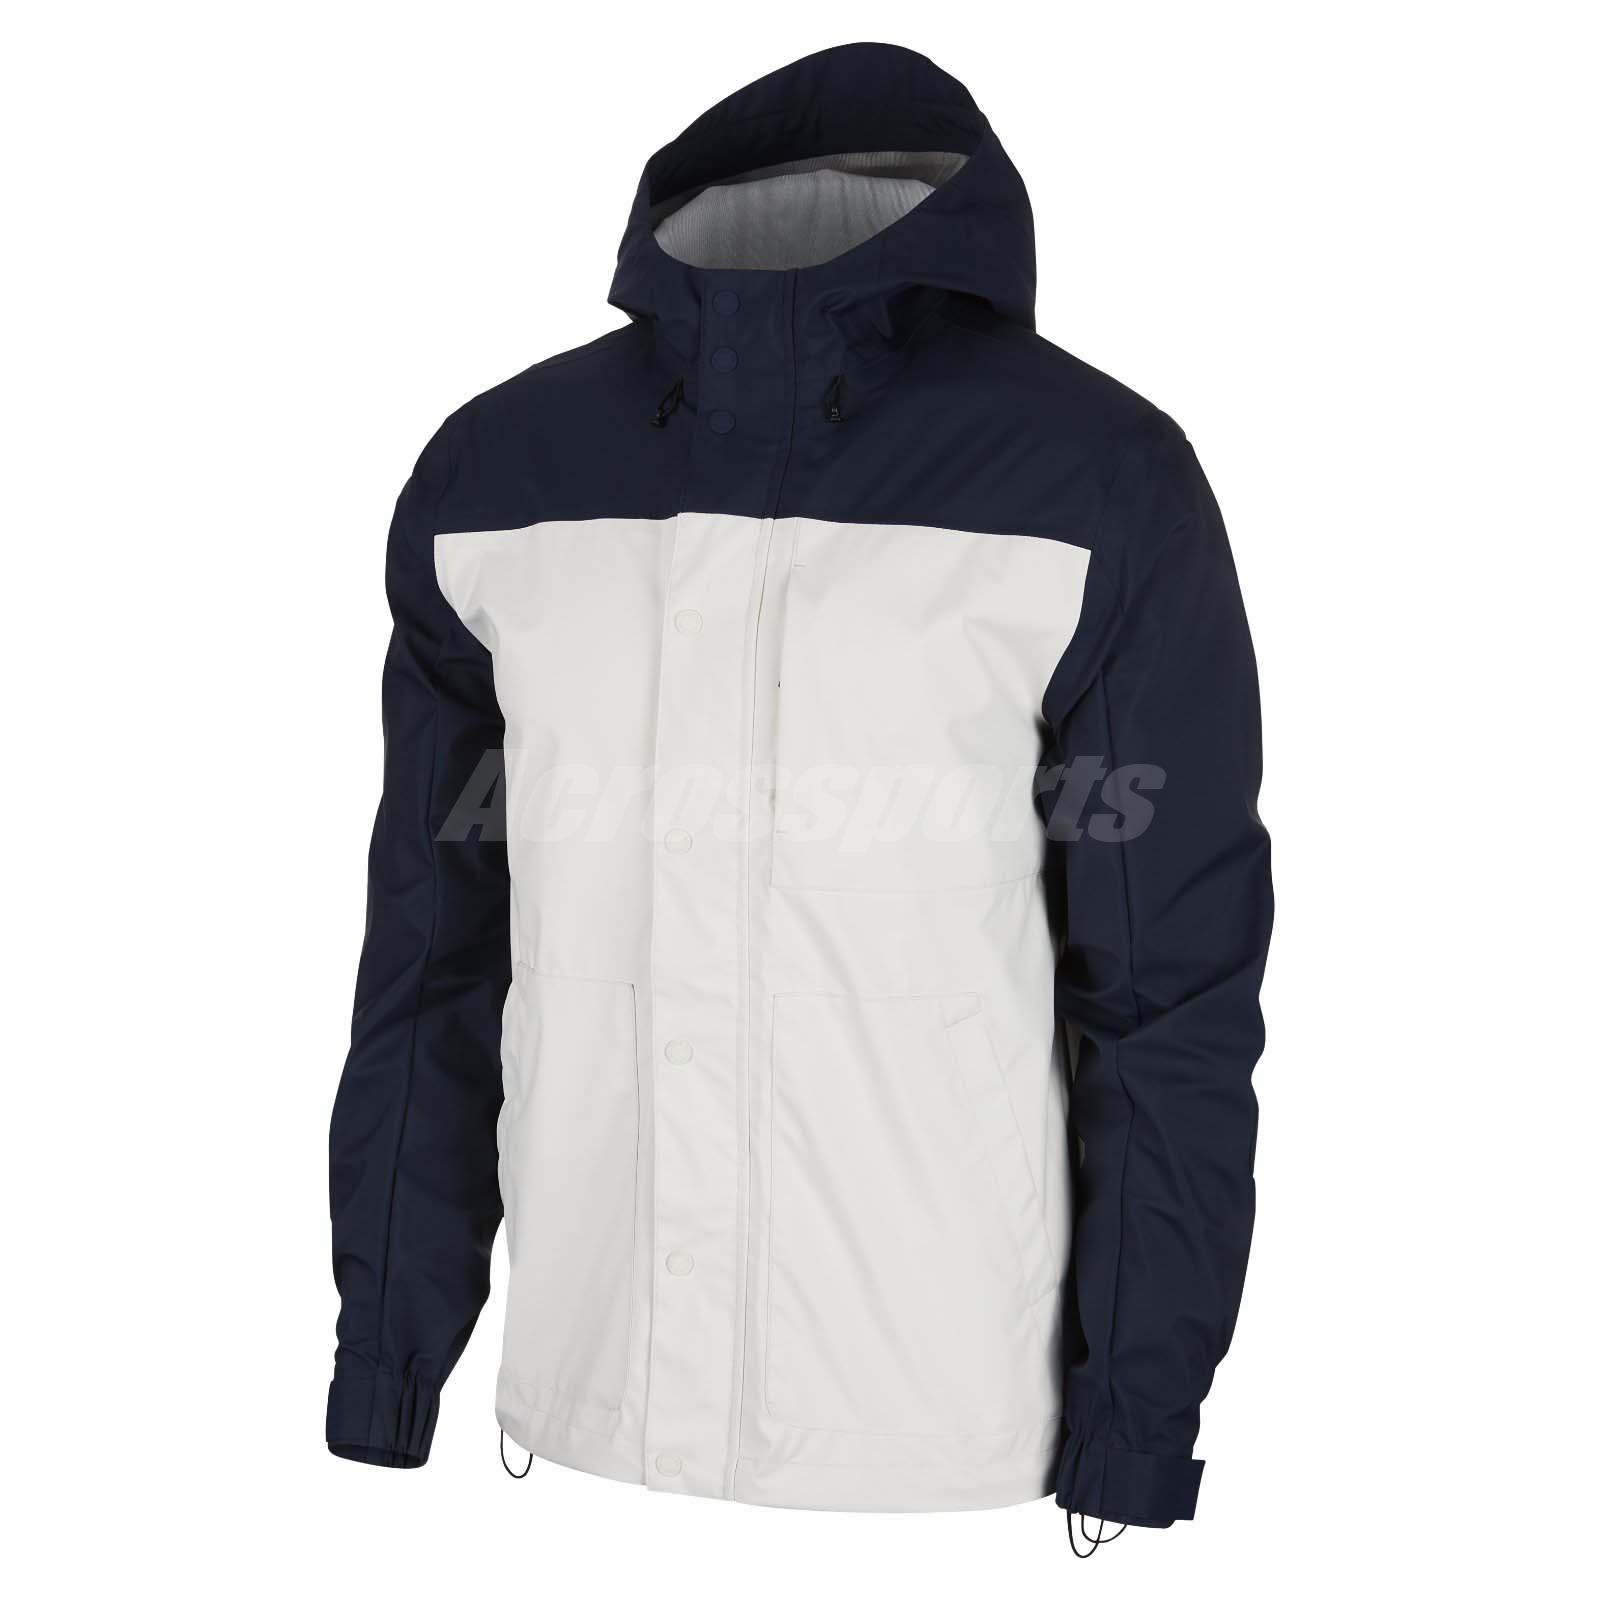 5c45fd3c Details about Nike SB Shield Jacket Winterized Chore Skateboarding Sports  Training 938479-451